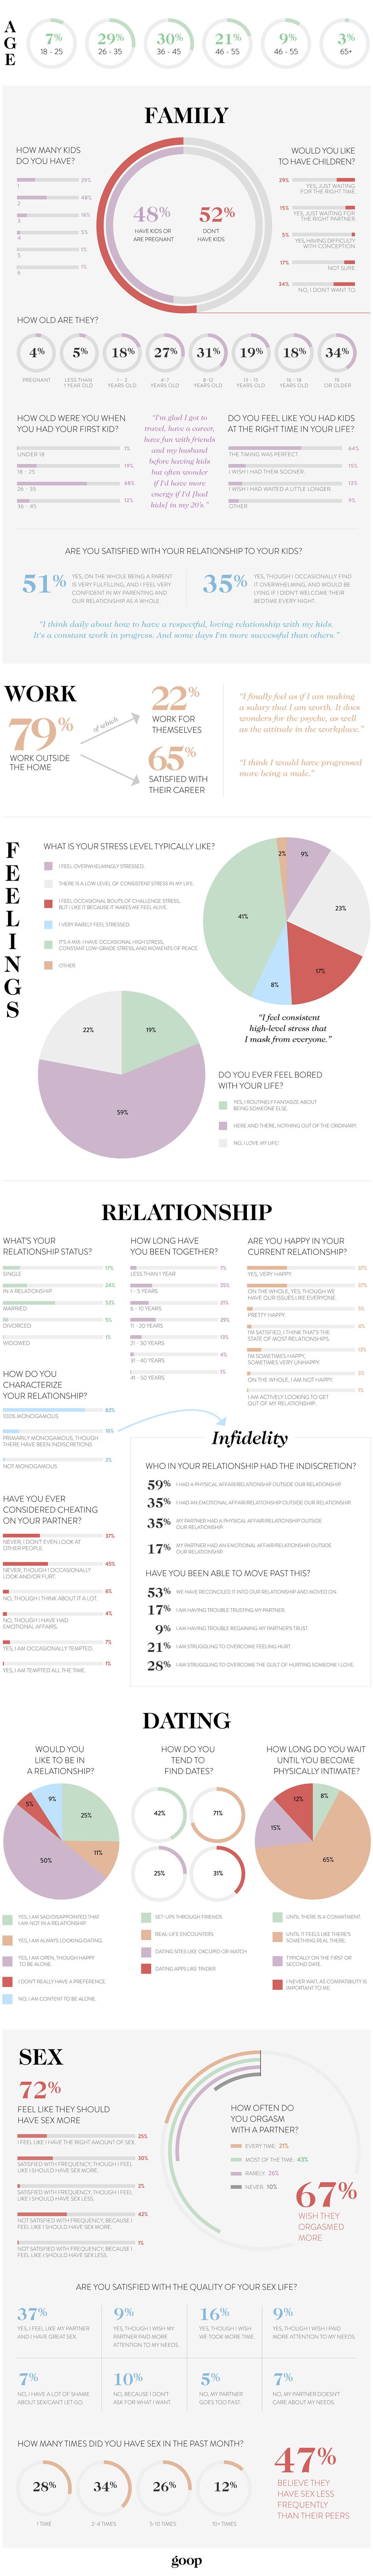 Sex surveys do women enjoy sex